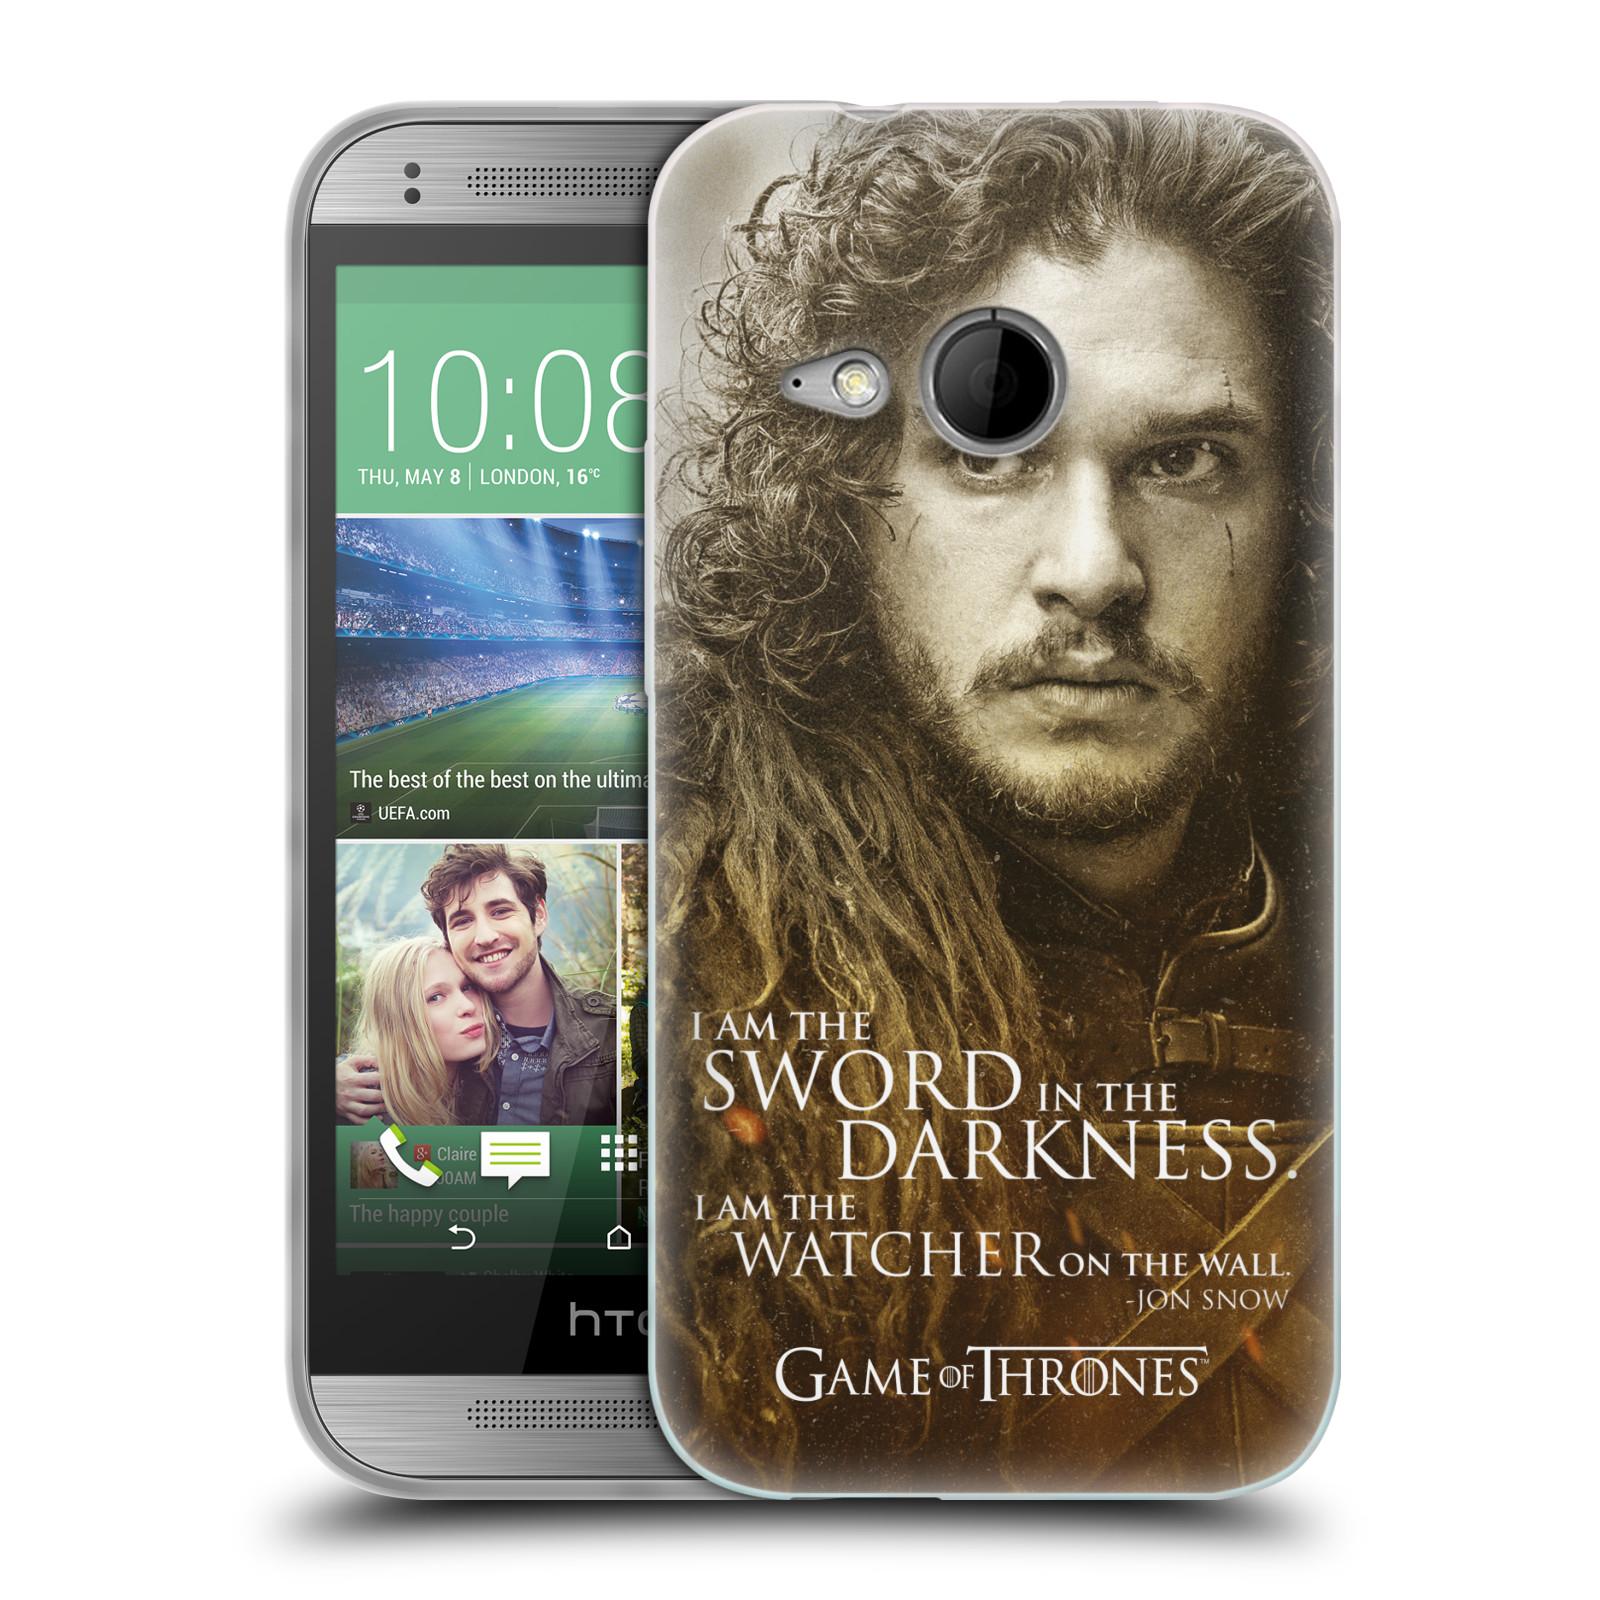 Silikonové pouzdro na mobil HTC ONE Mini 2 HEAD CASE Hra o trůny - Jon Snow (Silikonový kryt či obal na mobilní telefon s licencovaným motivem Hra o trůny - Game Of Thrones pro HTC ONE Mini 2)